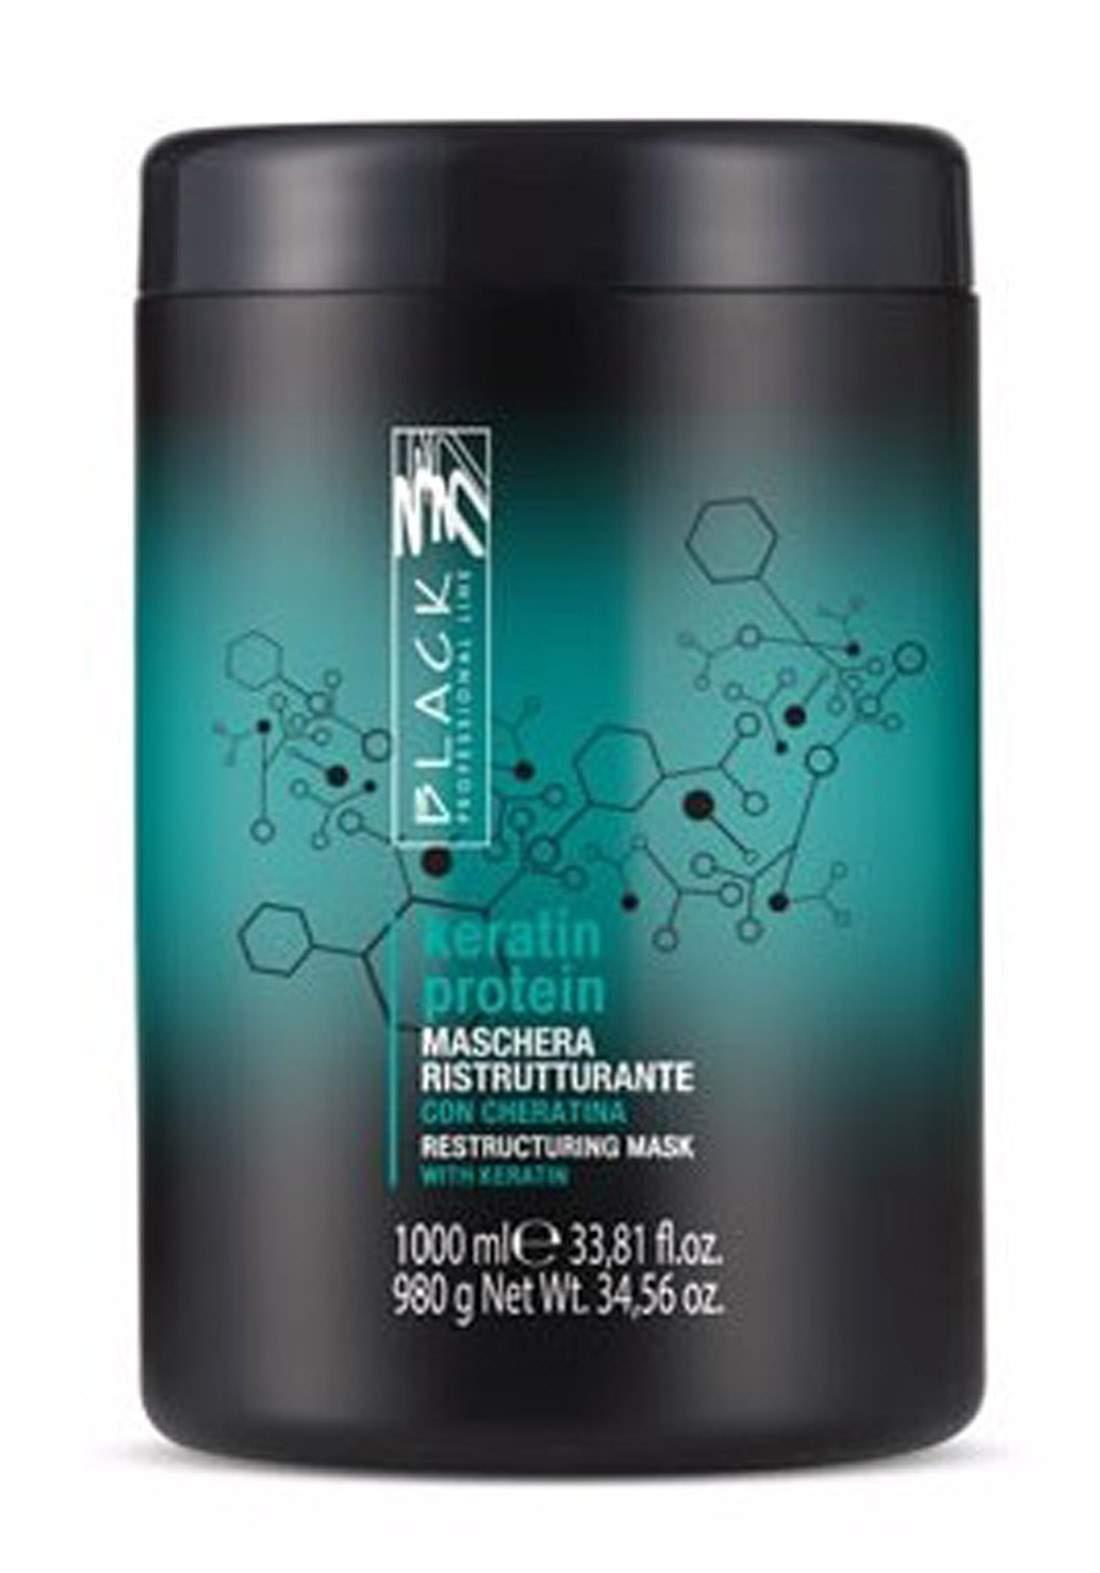 Black Keratin Protein Mask 1000ml ماسك للشعر